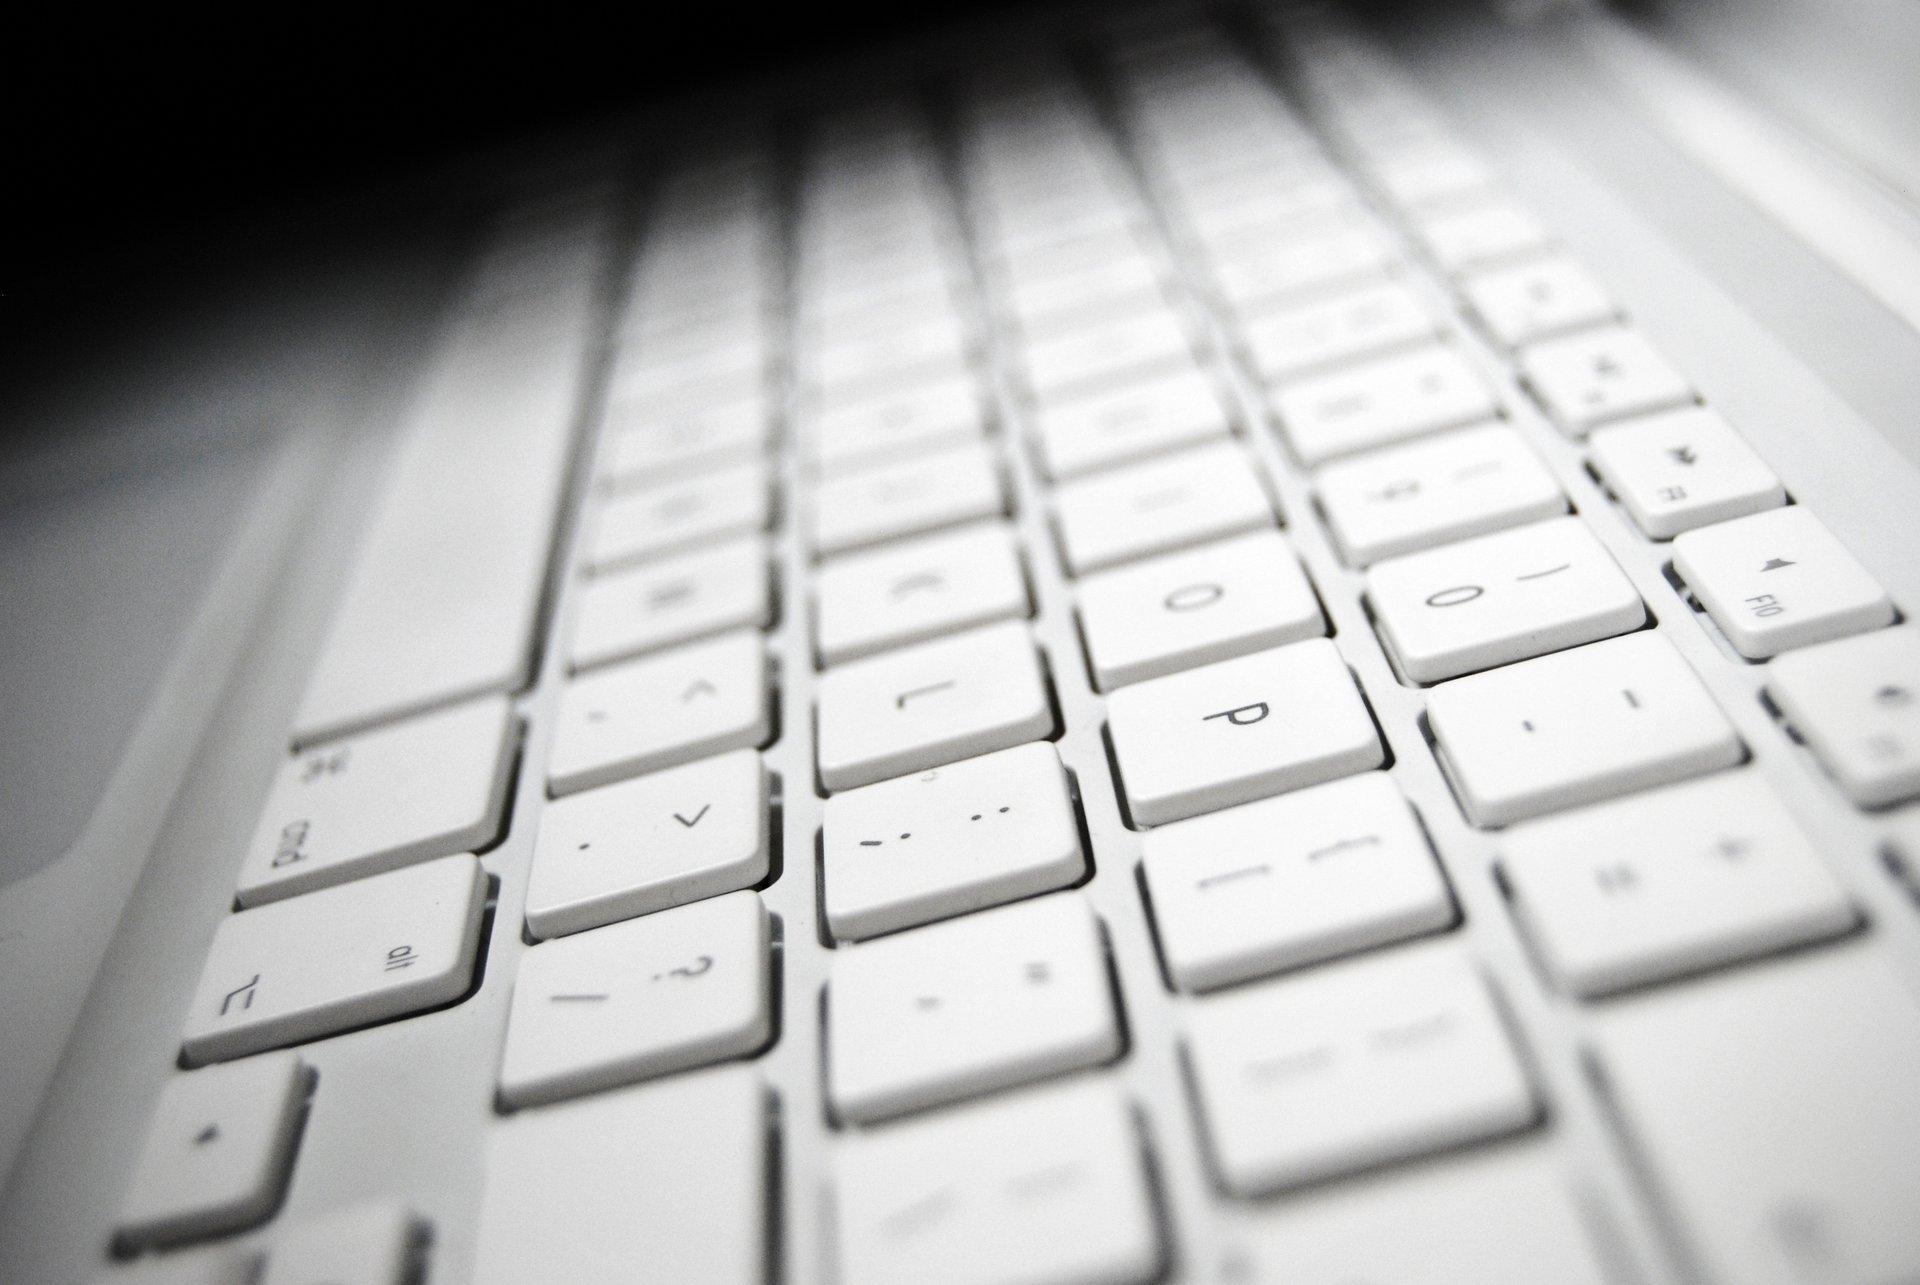 картинки на фон клавиатуру пожалуйста, какой